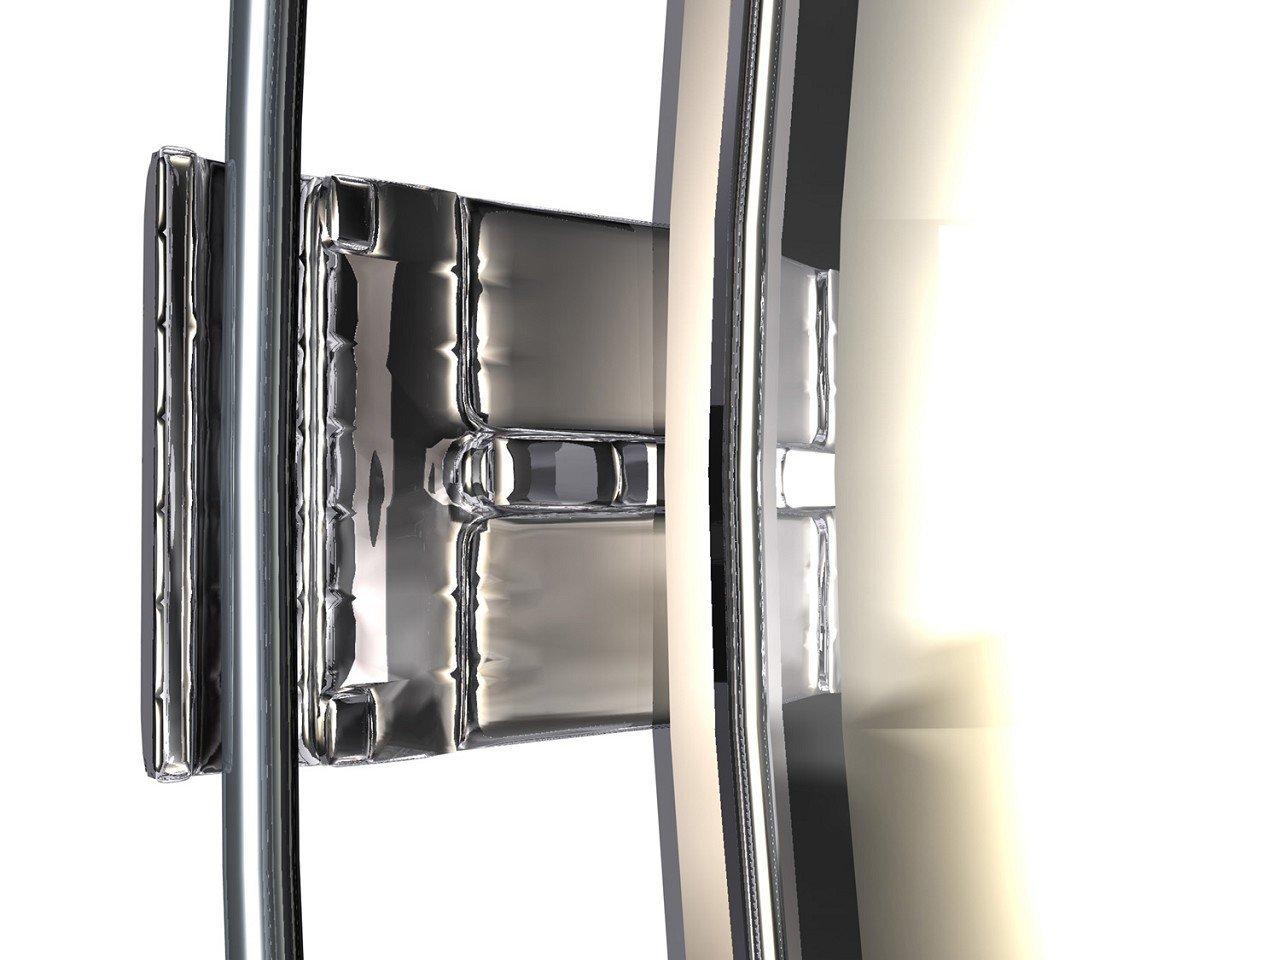 Radzierblendenset . 6 St/ück chrom 16 Zoll universell passendes Set Wohnmobile PKW Transporter 16 Zoll